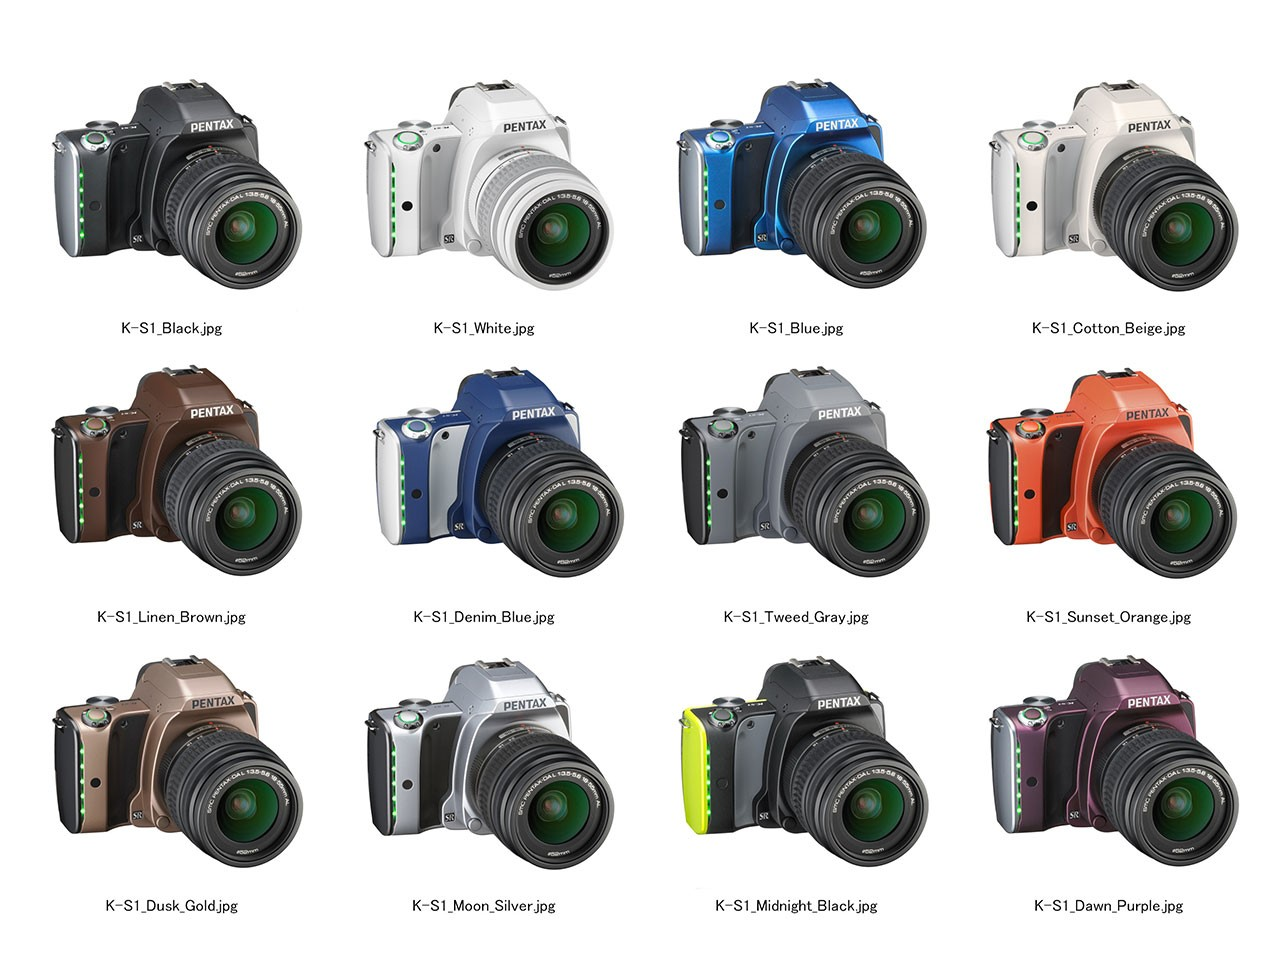 Pentax K S1 Camera News At Cameraegg Canon Eos 100d Dslr